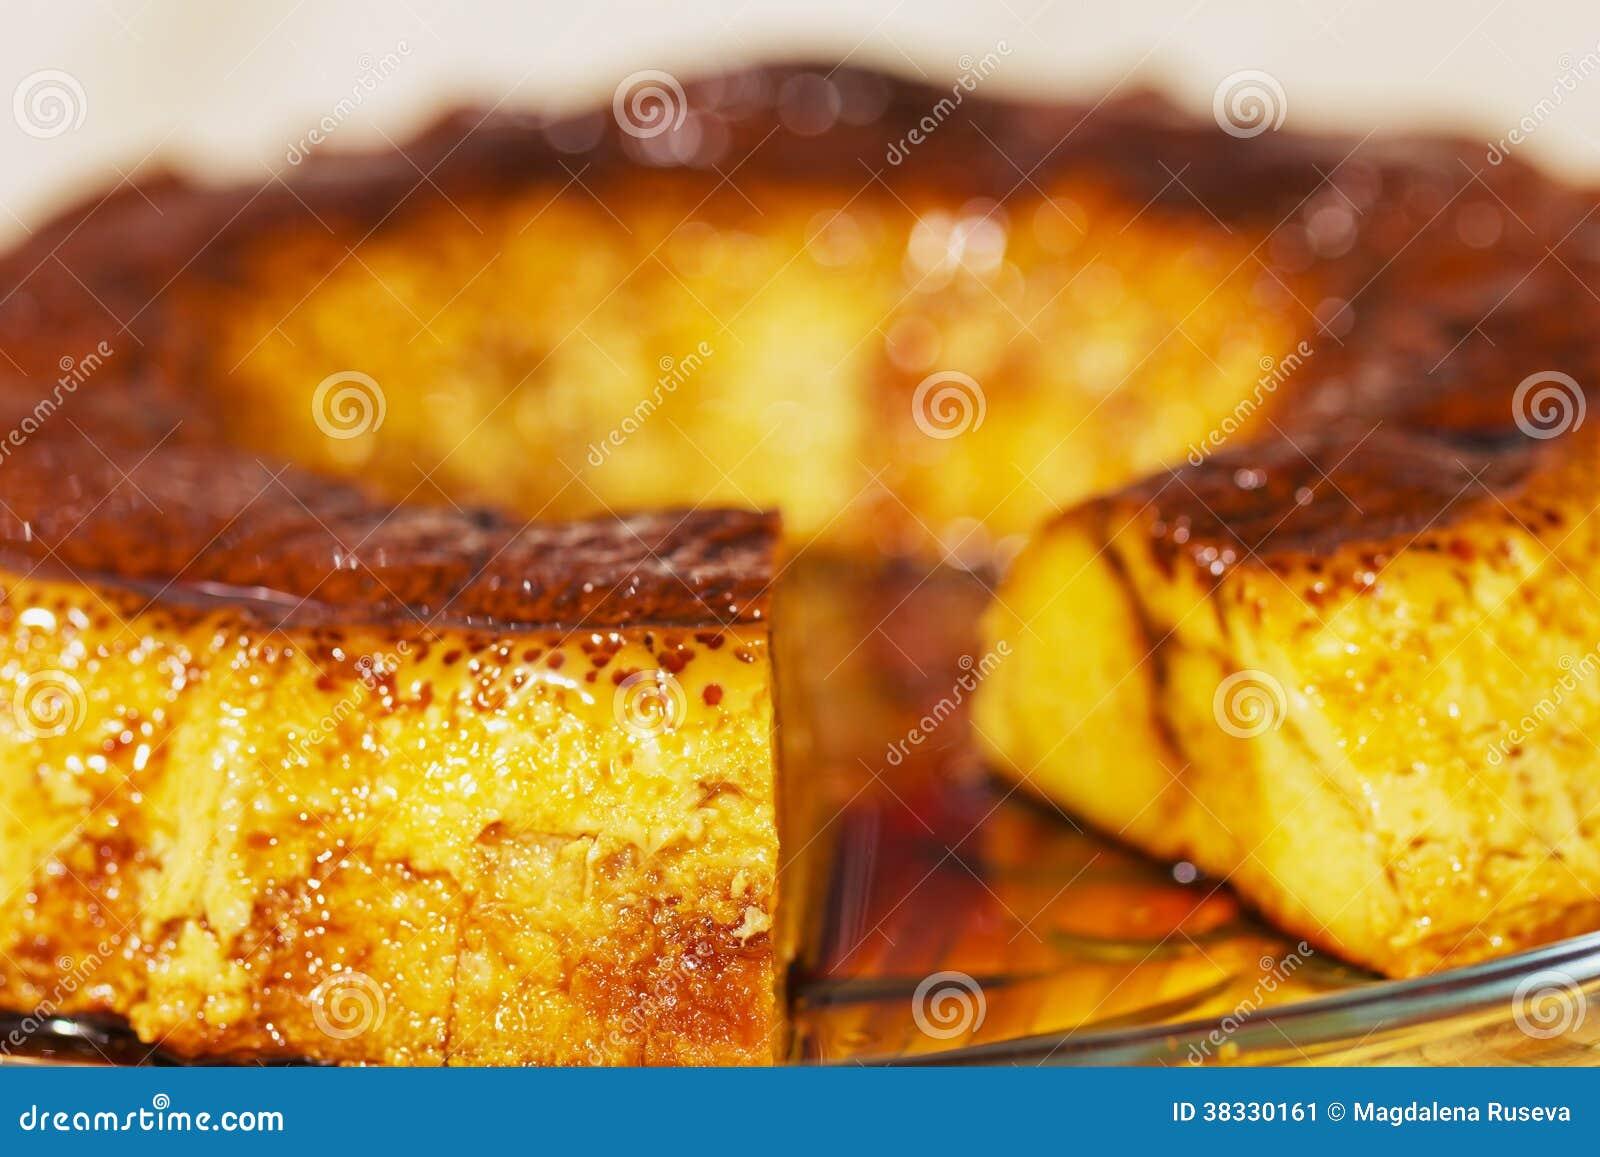 Caramel Custard, Flan. Creme Caramel Stock Image - Image: 38330161